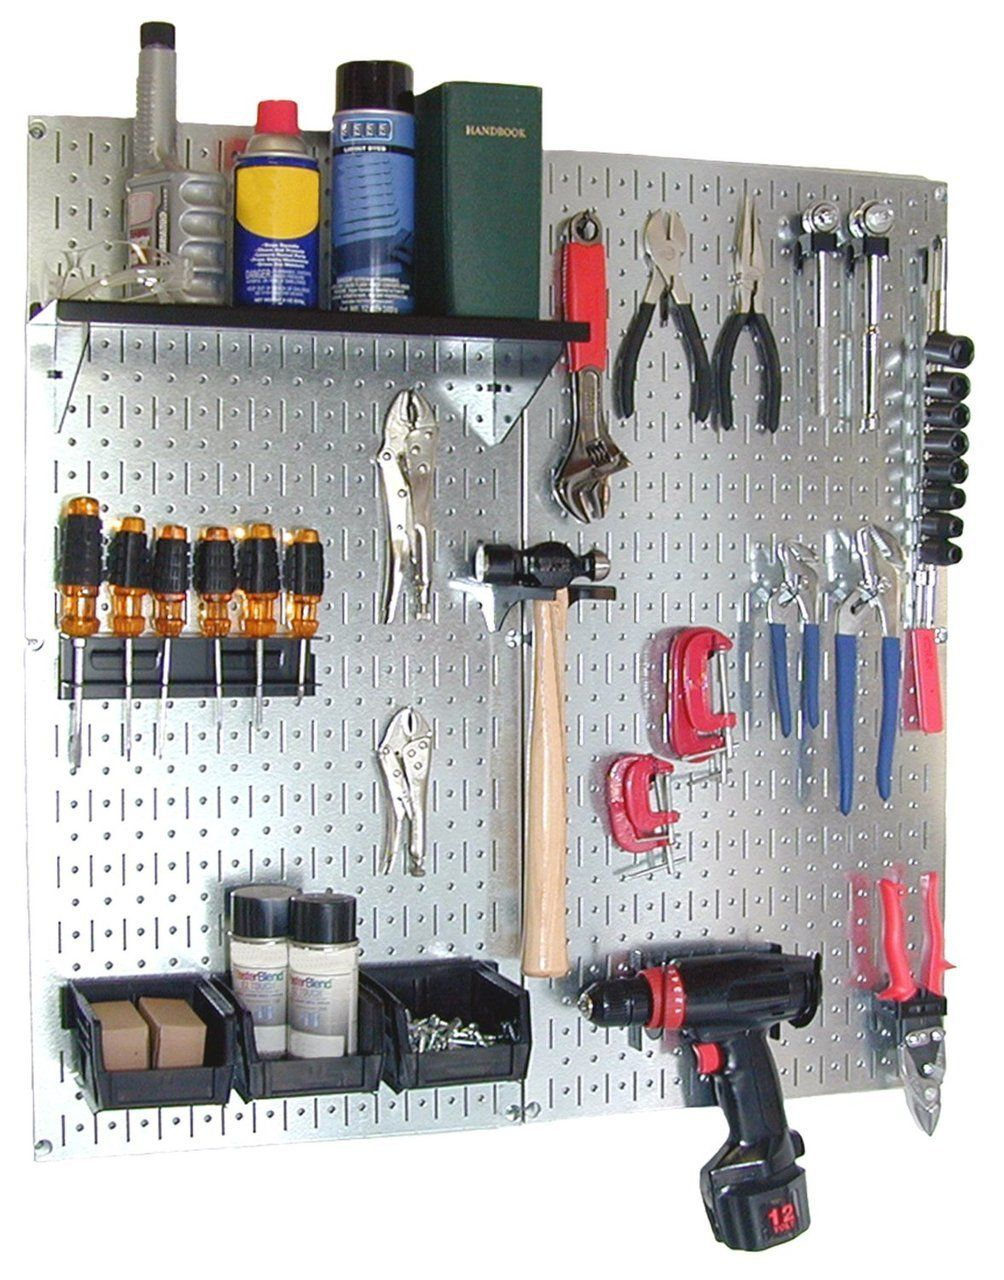 Metal Pegboard Utility Tool Storage Kit Metallic Pegboard With Accessories Steel Pegboard Storage Kits Metal Pegboard